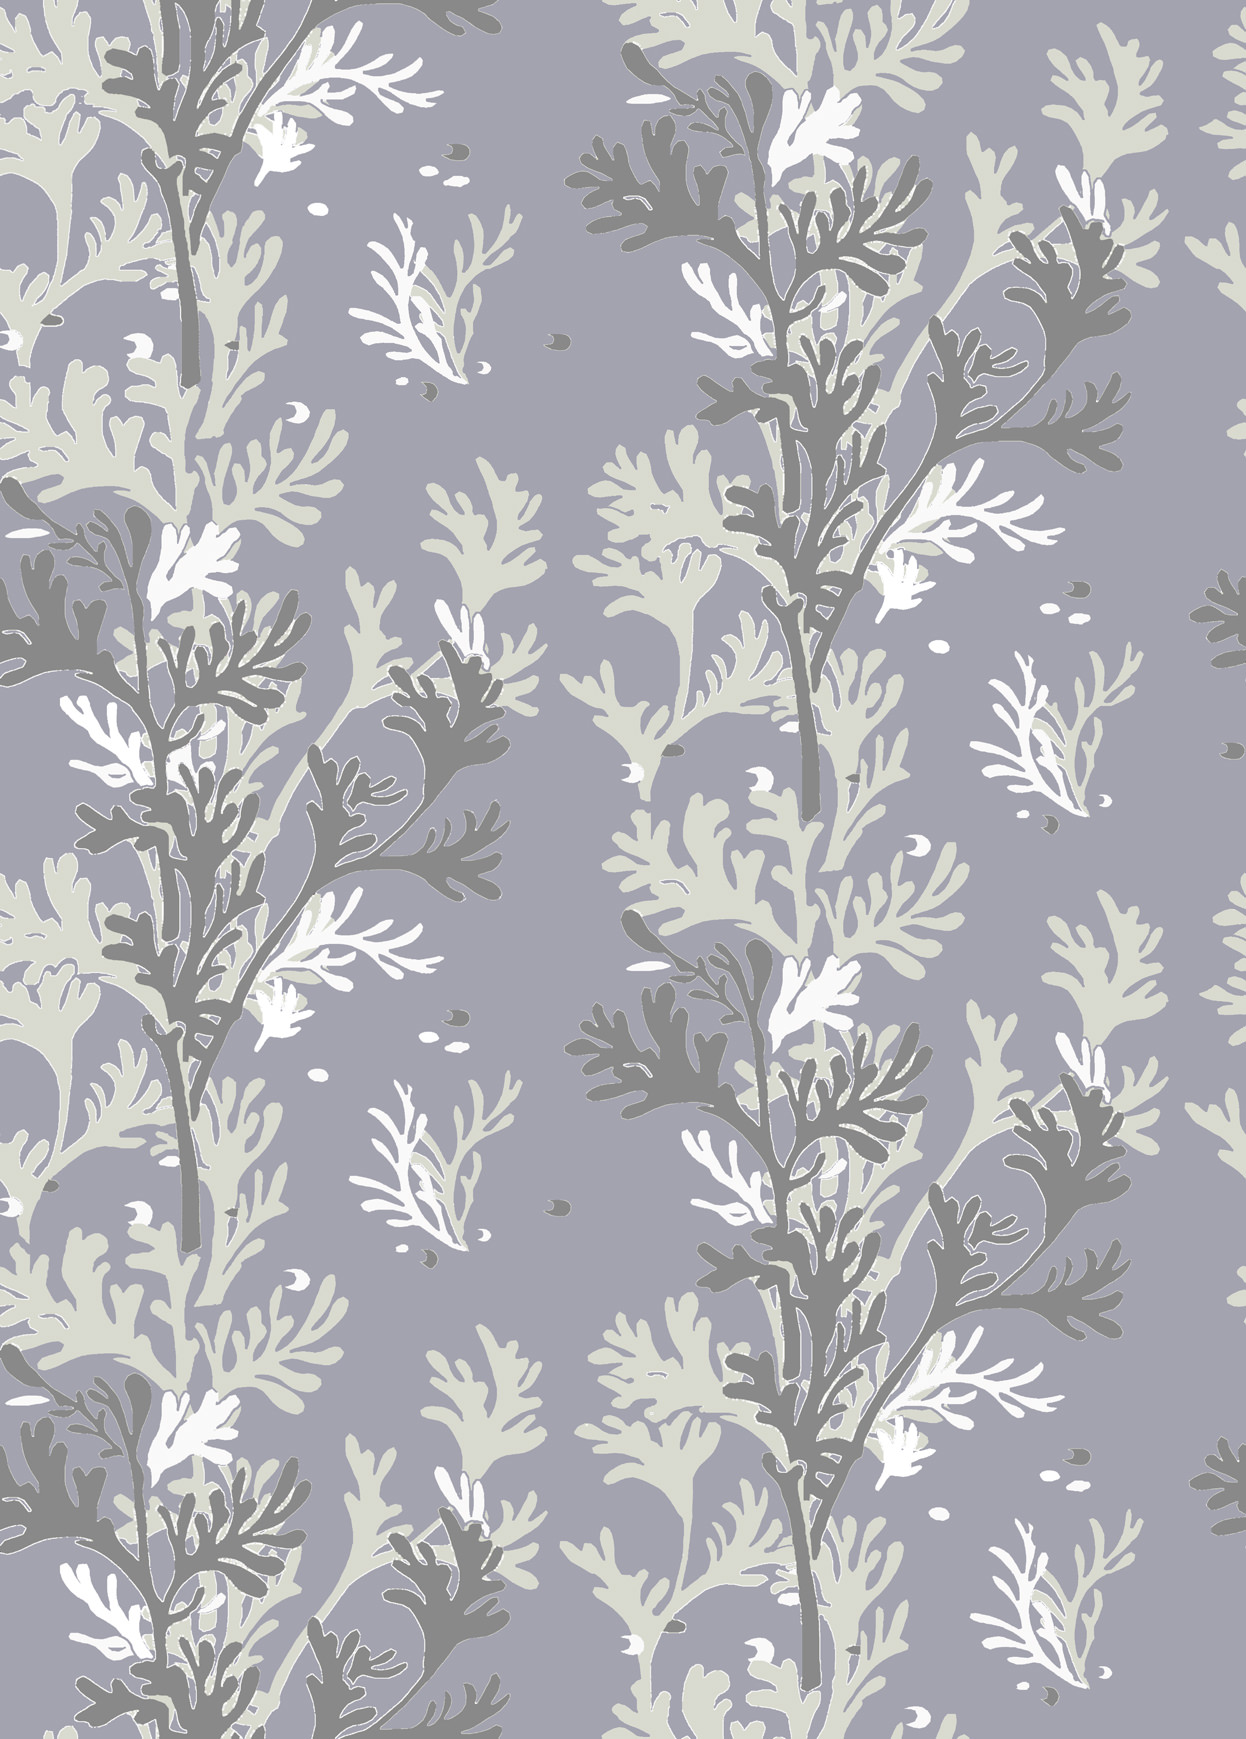 seaweed fabric grey.jpg